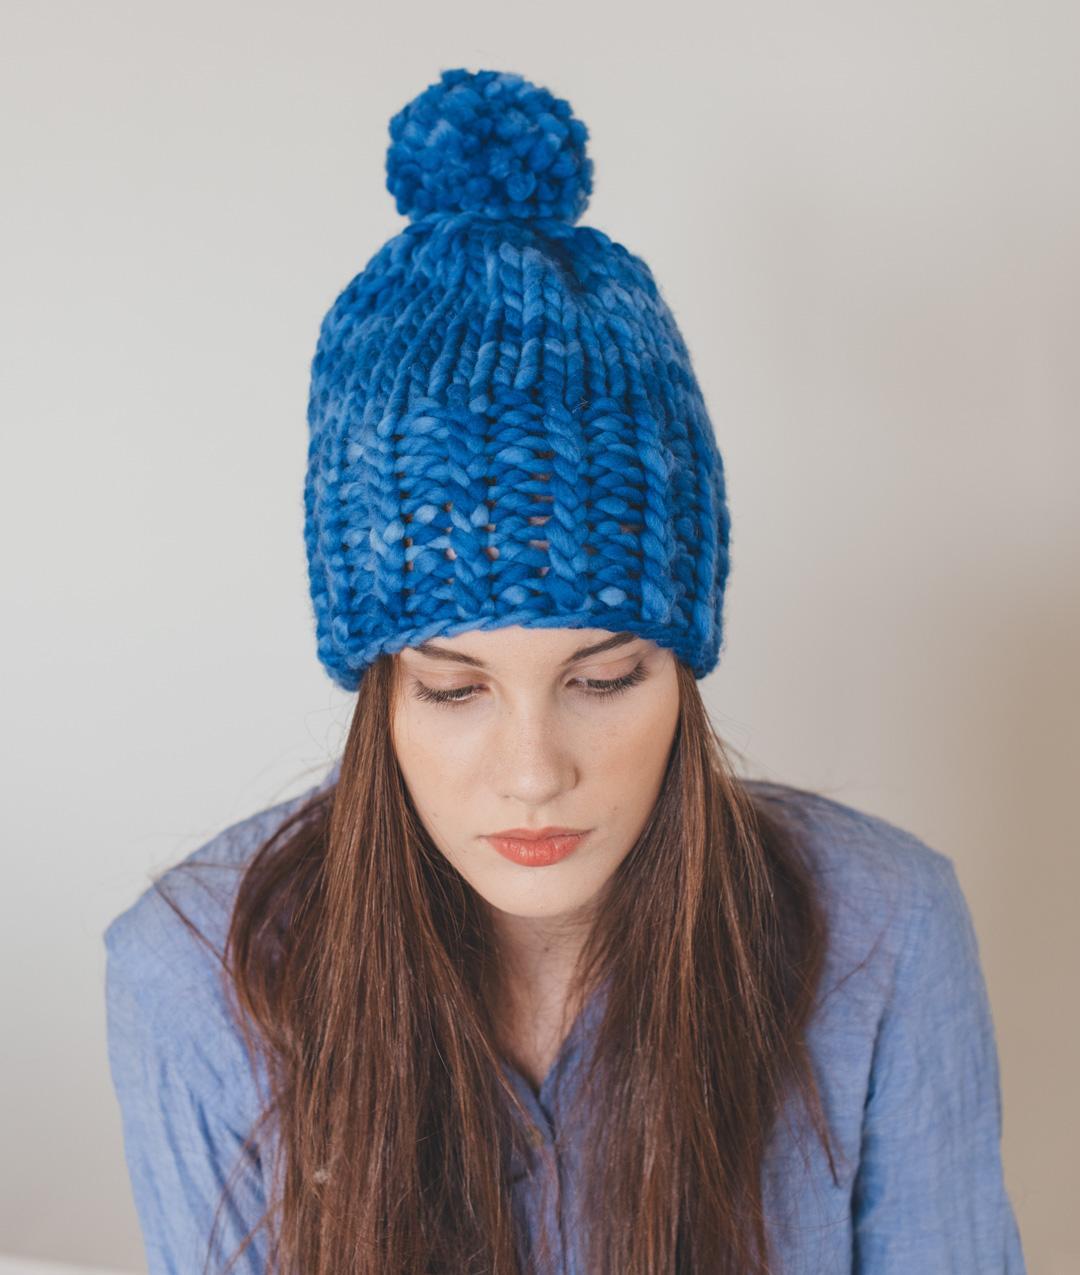 Hats and Beanies - Wool - Rib Twisted Beanie - 1